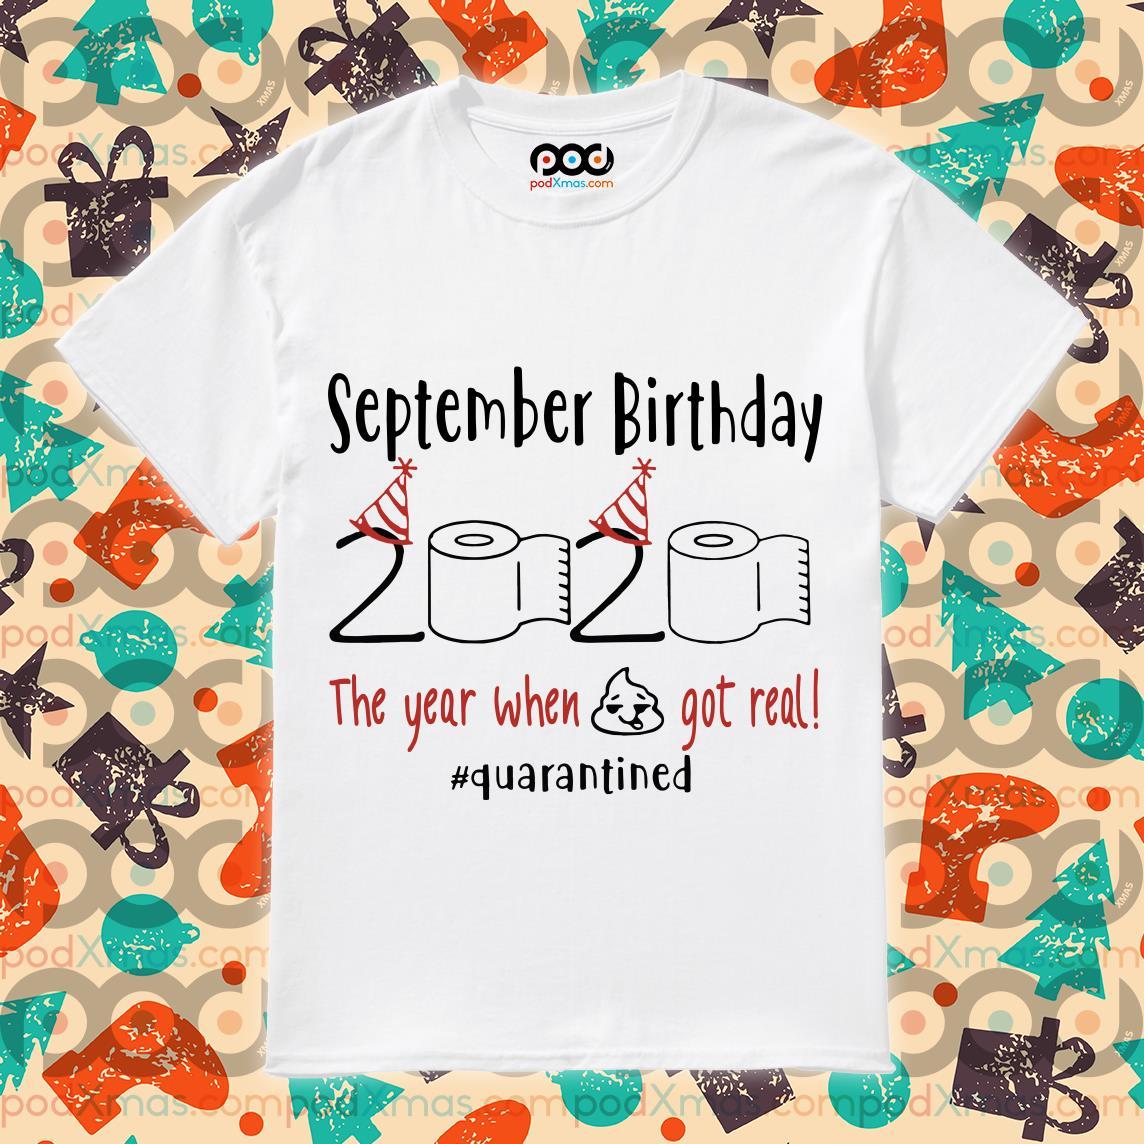 September Birthday 2020 Quarantined T-shirt